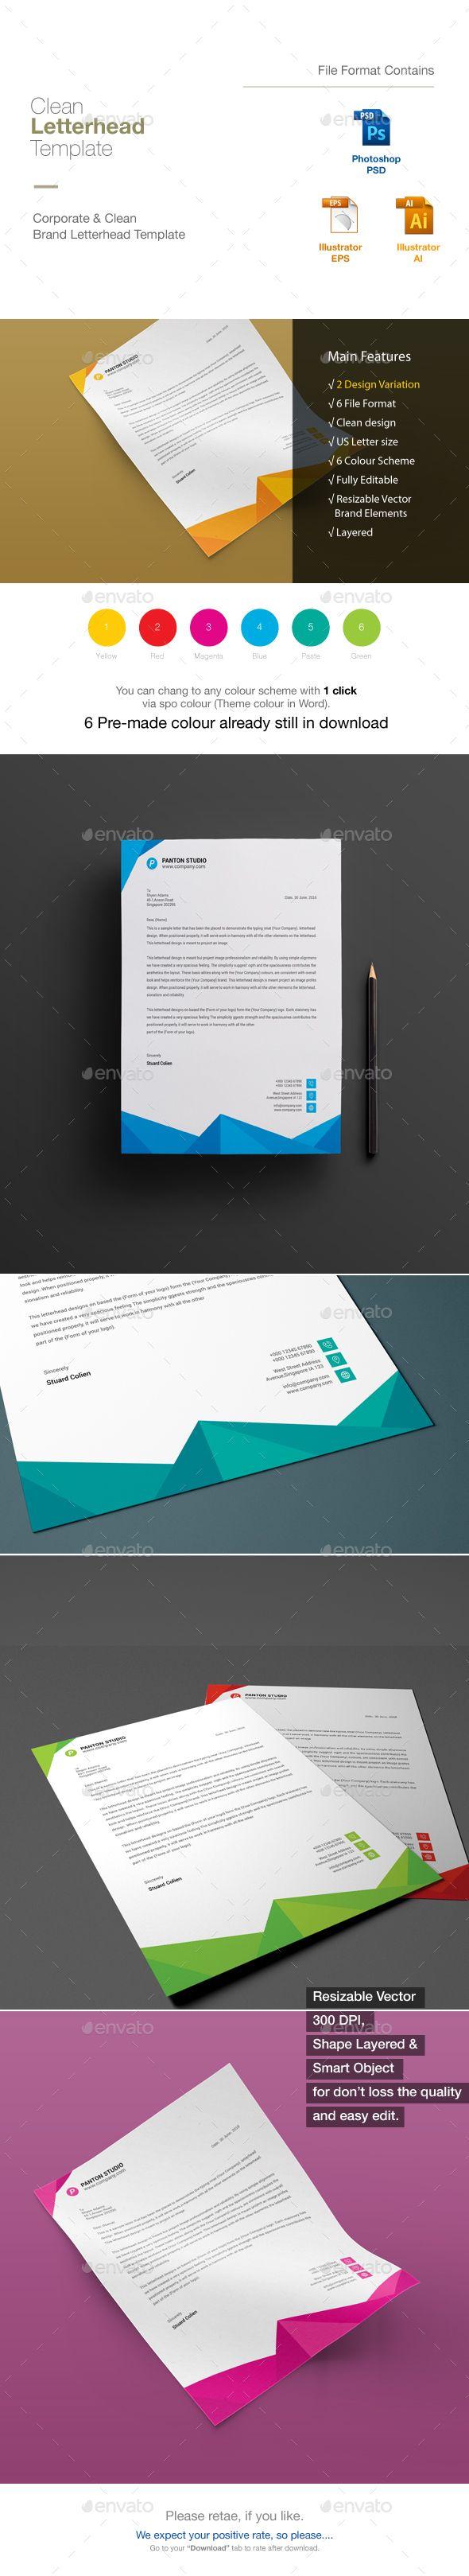 80 best letterhead design templates images on pinterest contact letterhead spiritdancerdesigns Image collections